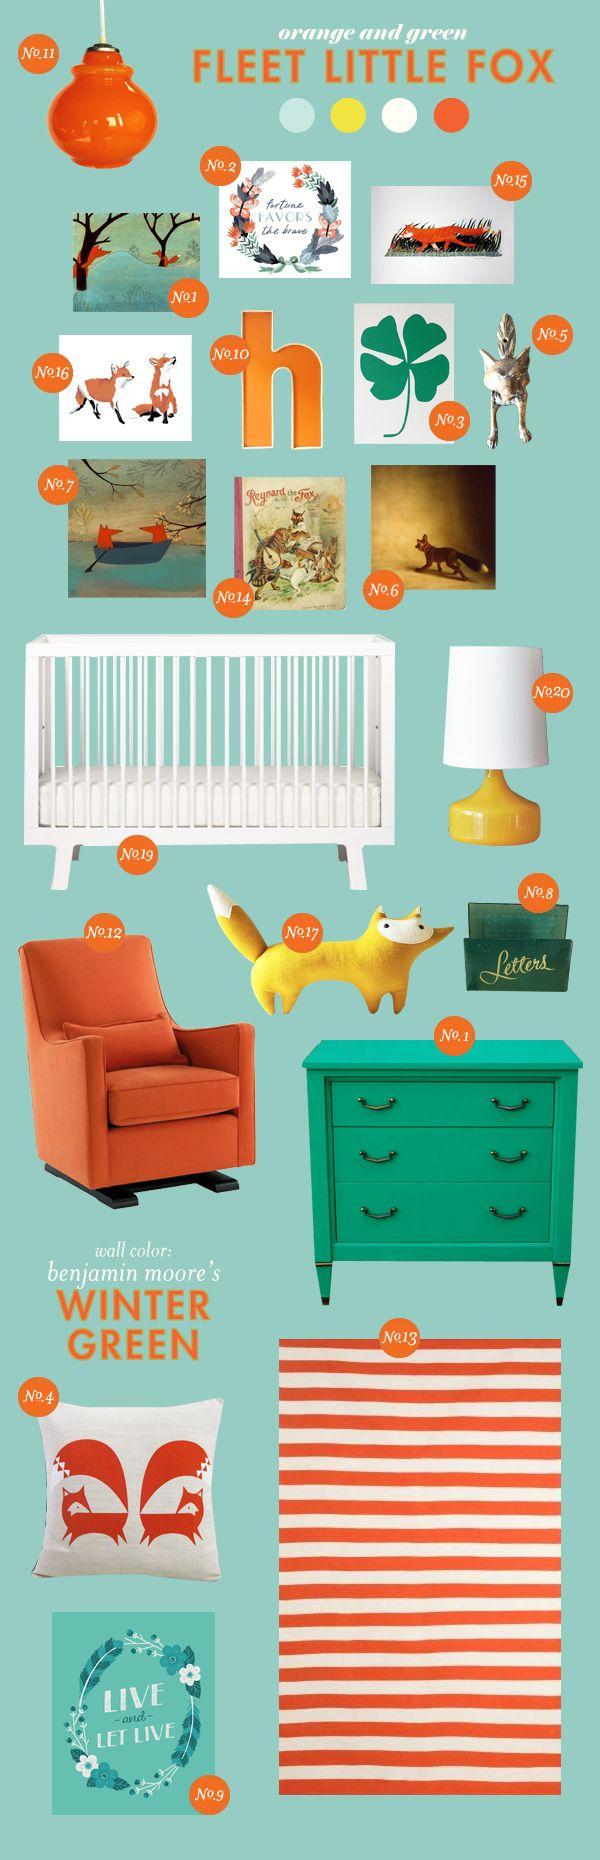 fleet little fox: nursery idea... this site has a TON of great nursery moodboards